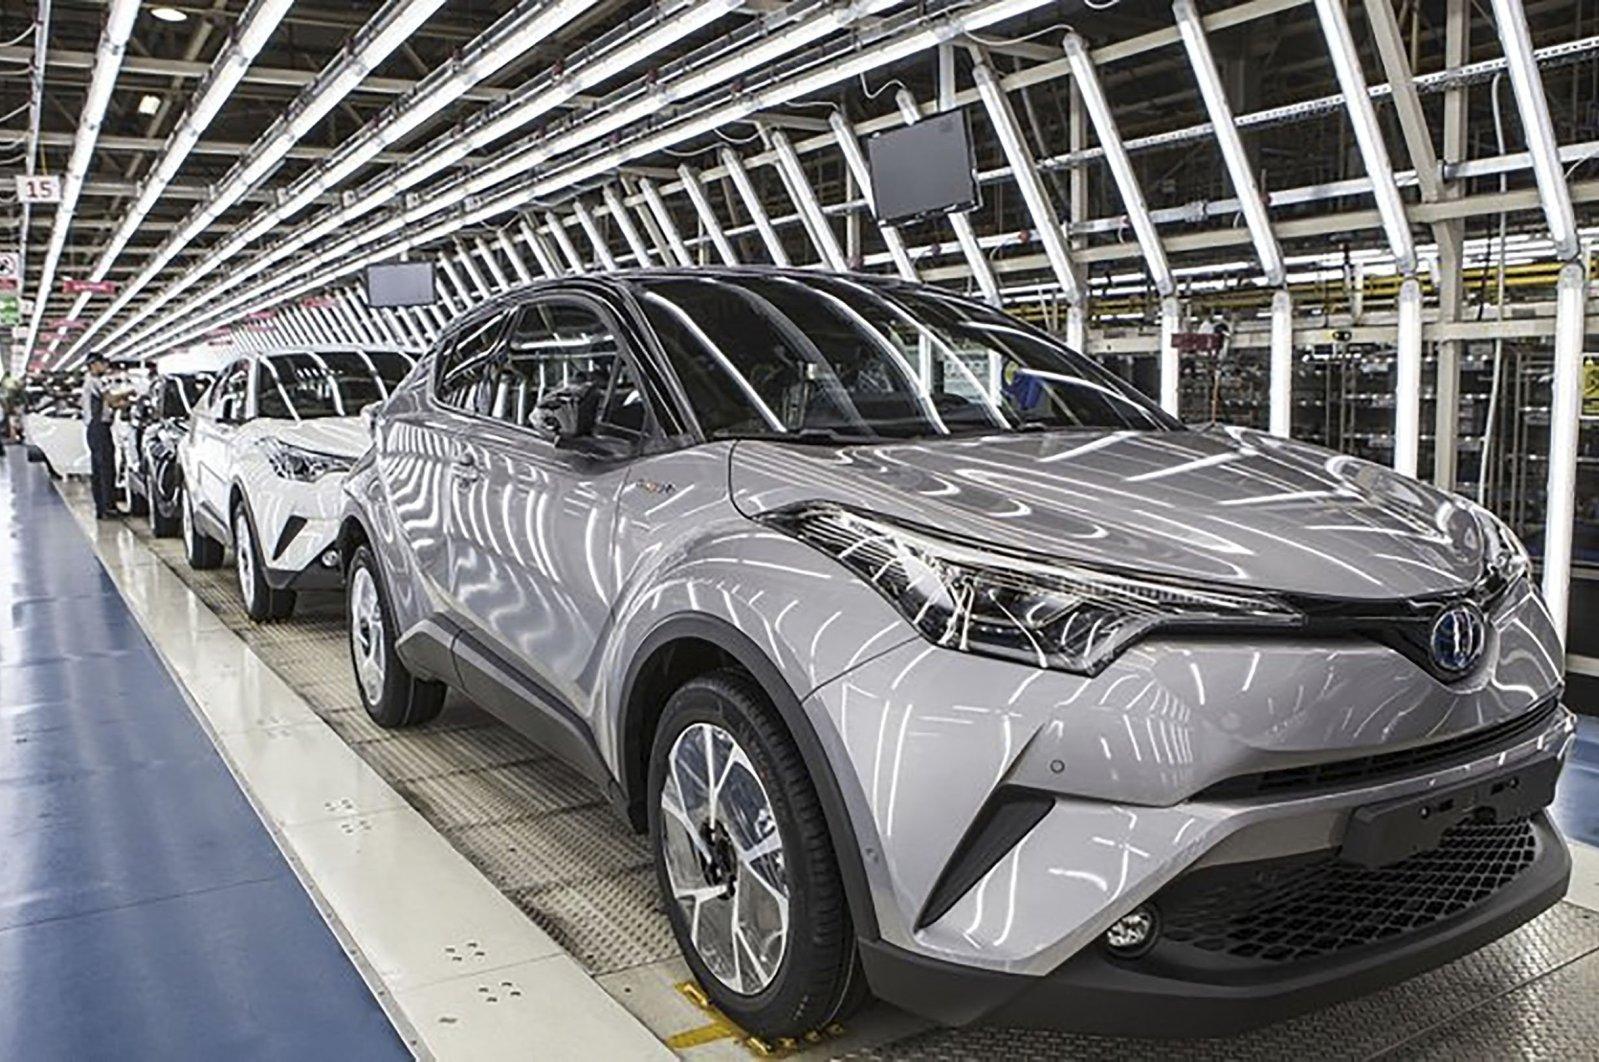 A production line for Toyota's C-HR hybrid SUV at the company's plant, northwestern Sakarya, Turkey. (Source: TOYOTA)